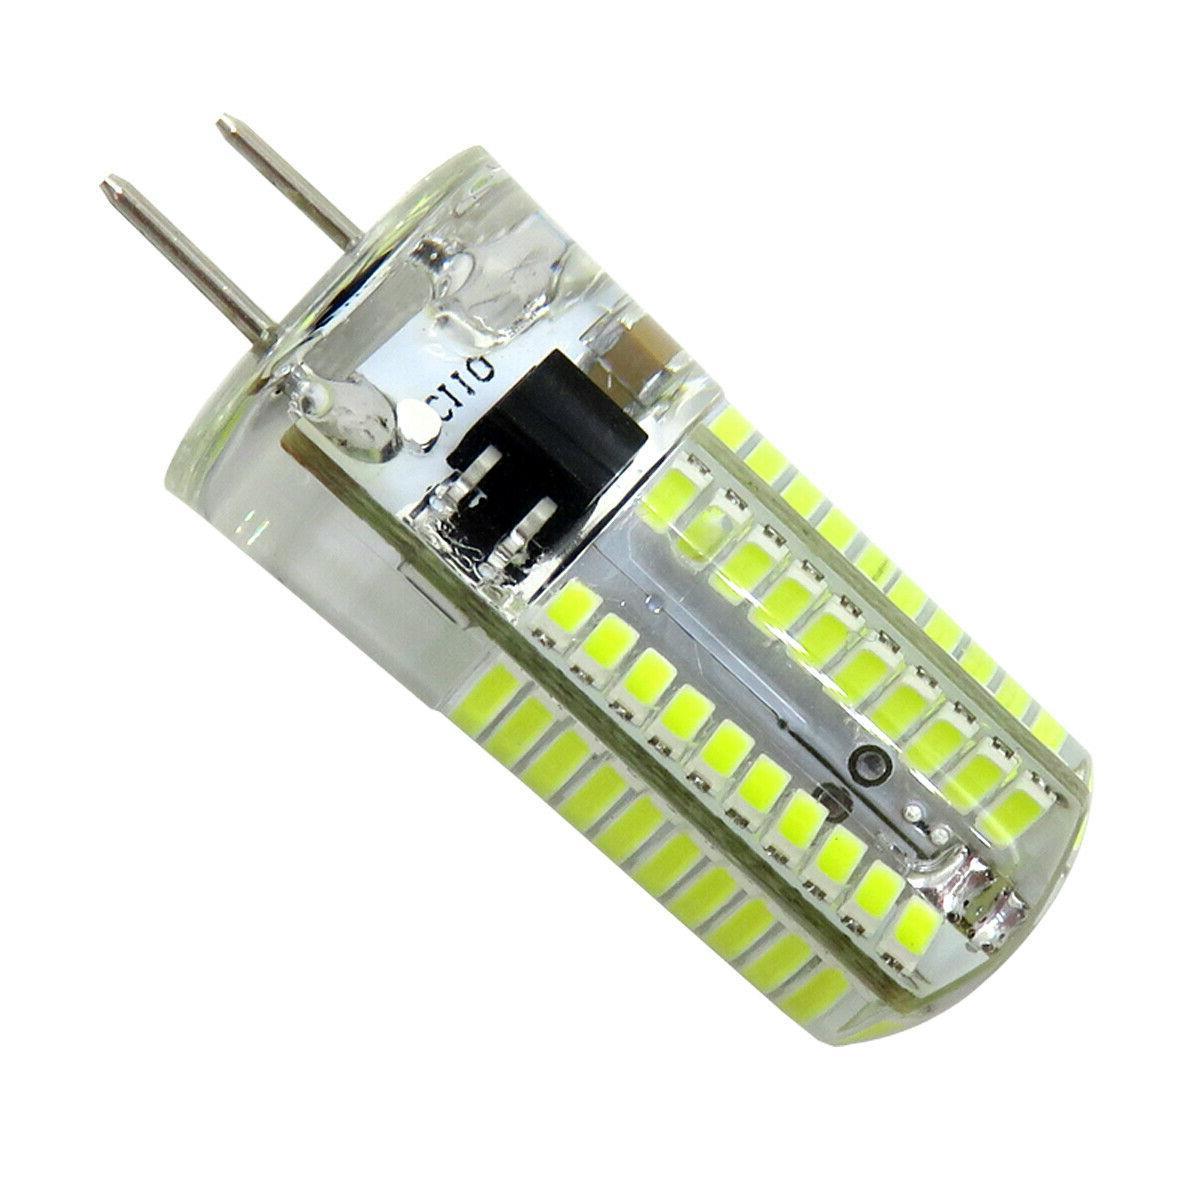 10pcs T5 80 3014 LED DayLight Dimmable White